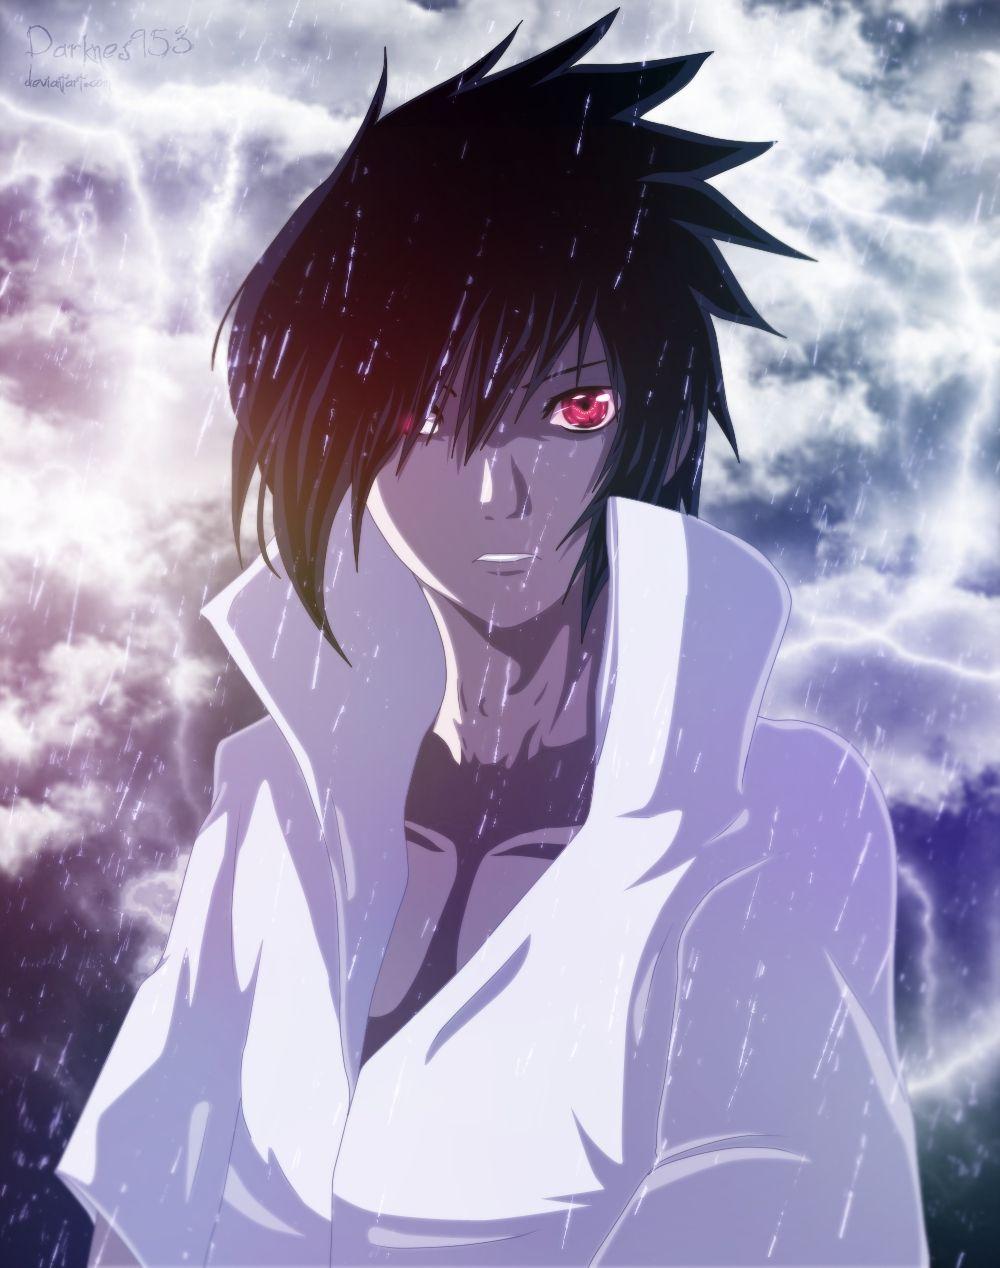 Sasuke Uchiha Sasuke is stupid but we love him